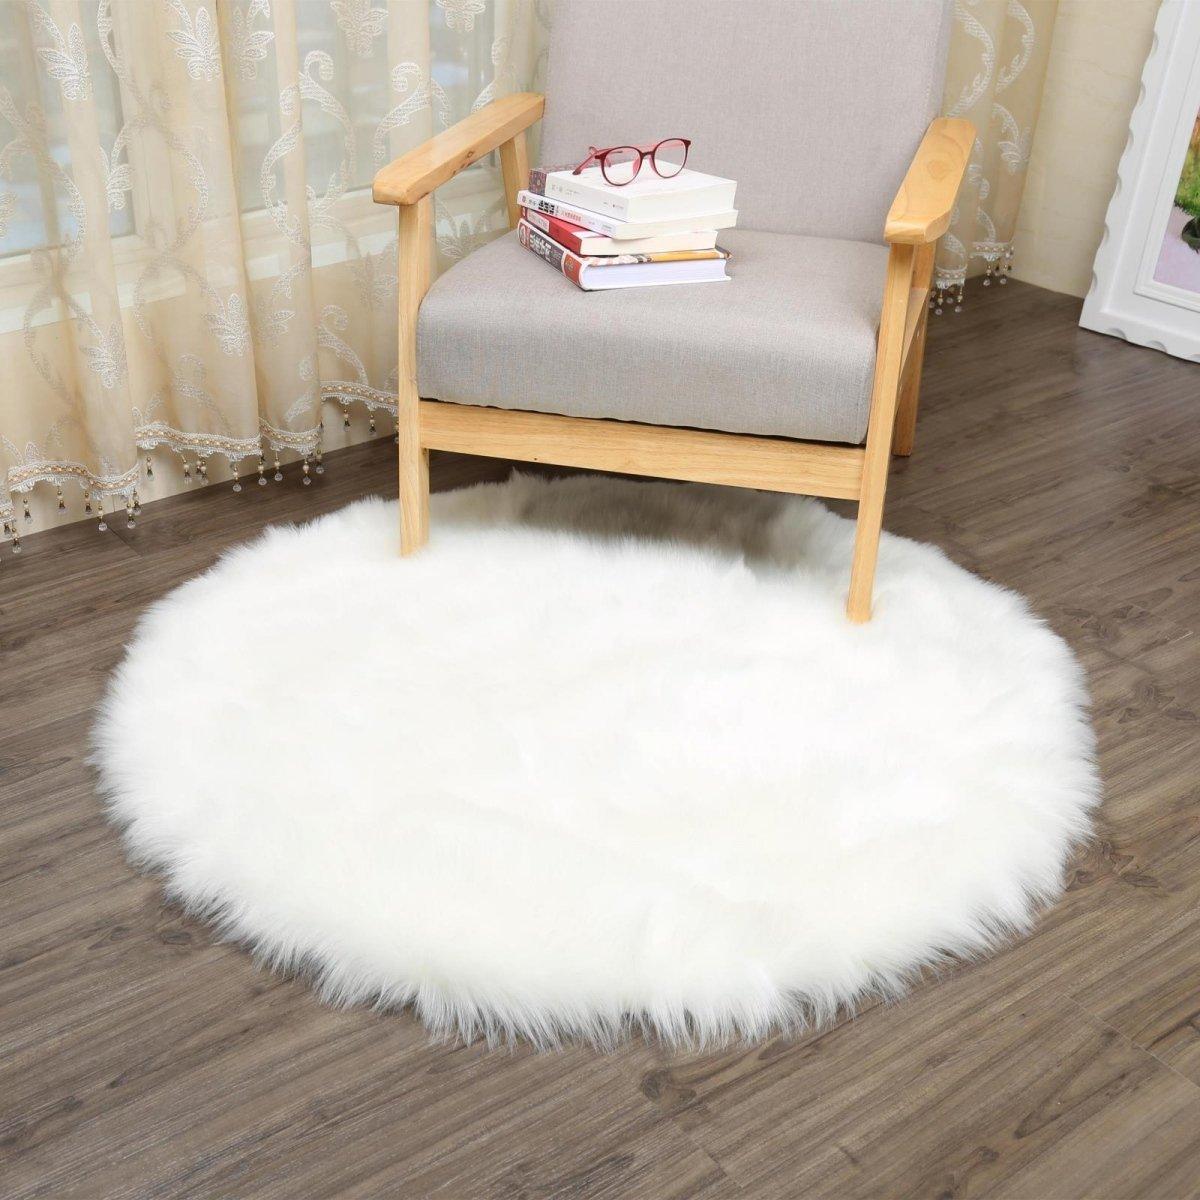 FurFurug Faux Silky Deluxe Sheepskin Area Shag Rug Children Play Carpet White,4ft